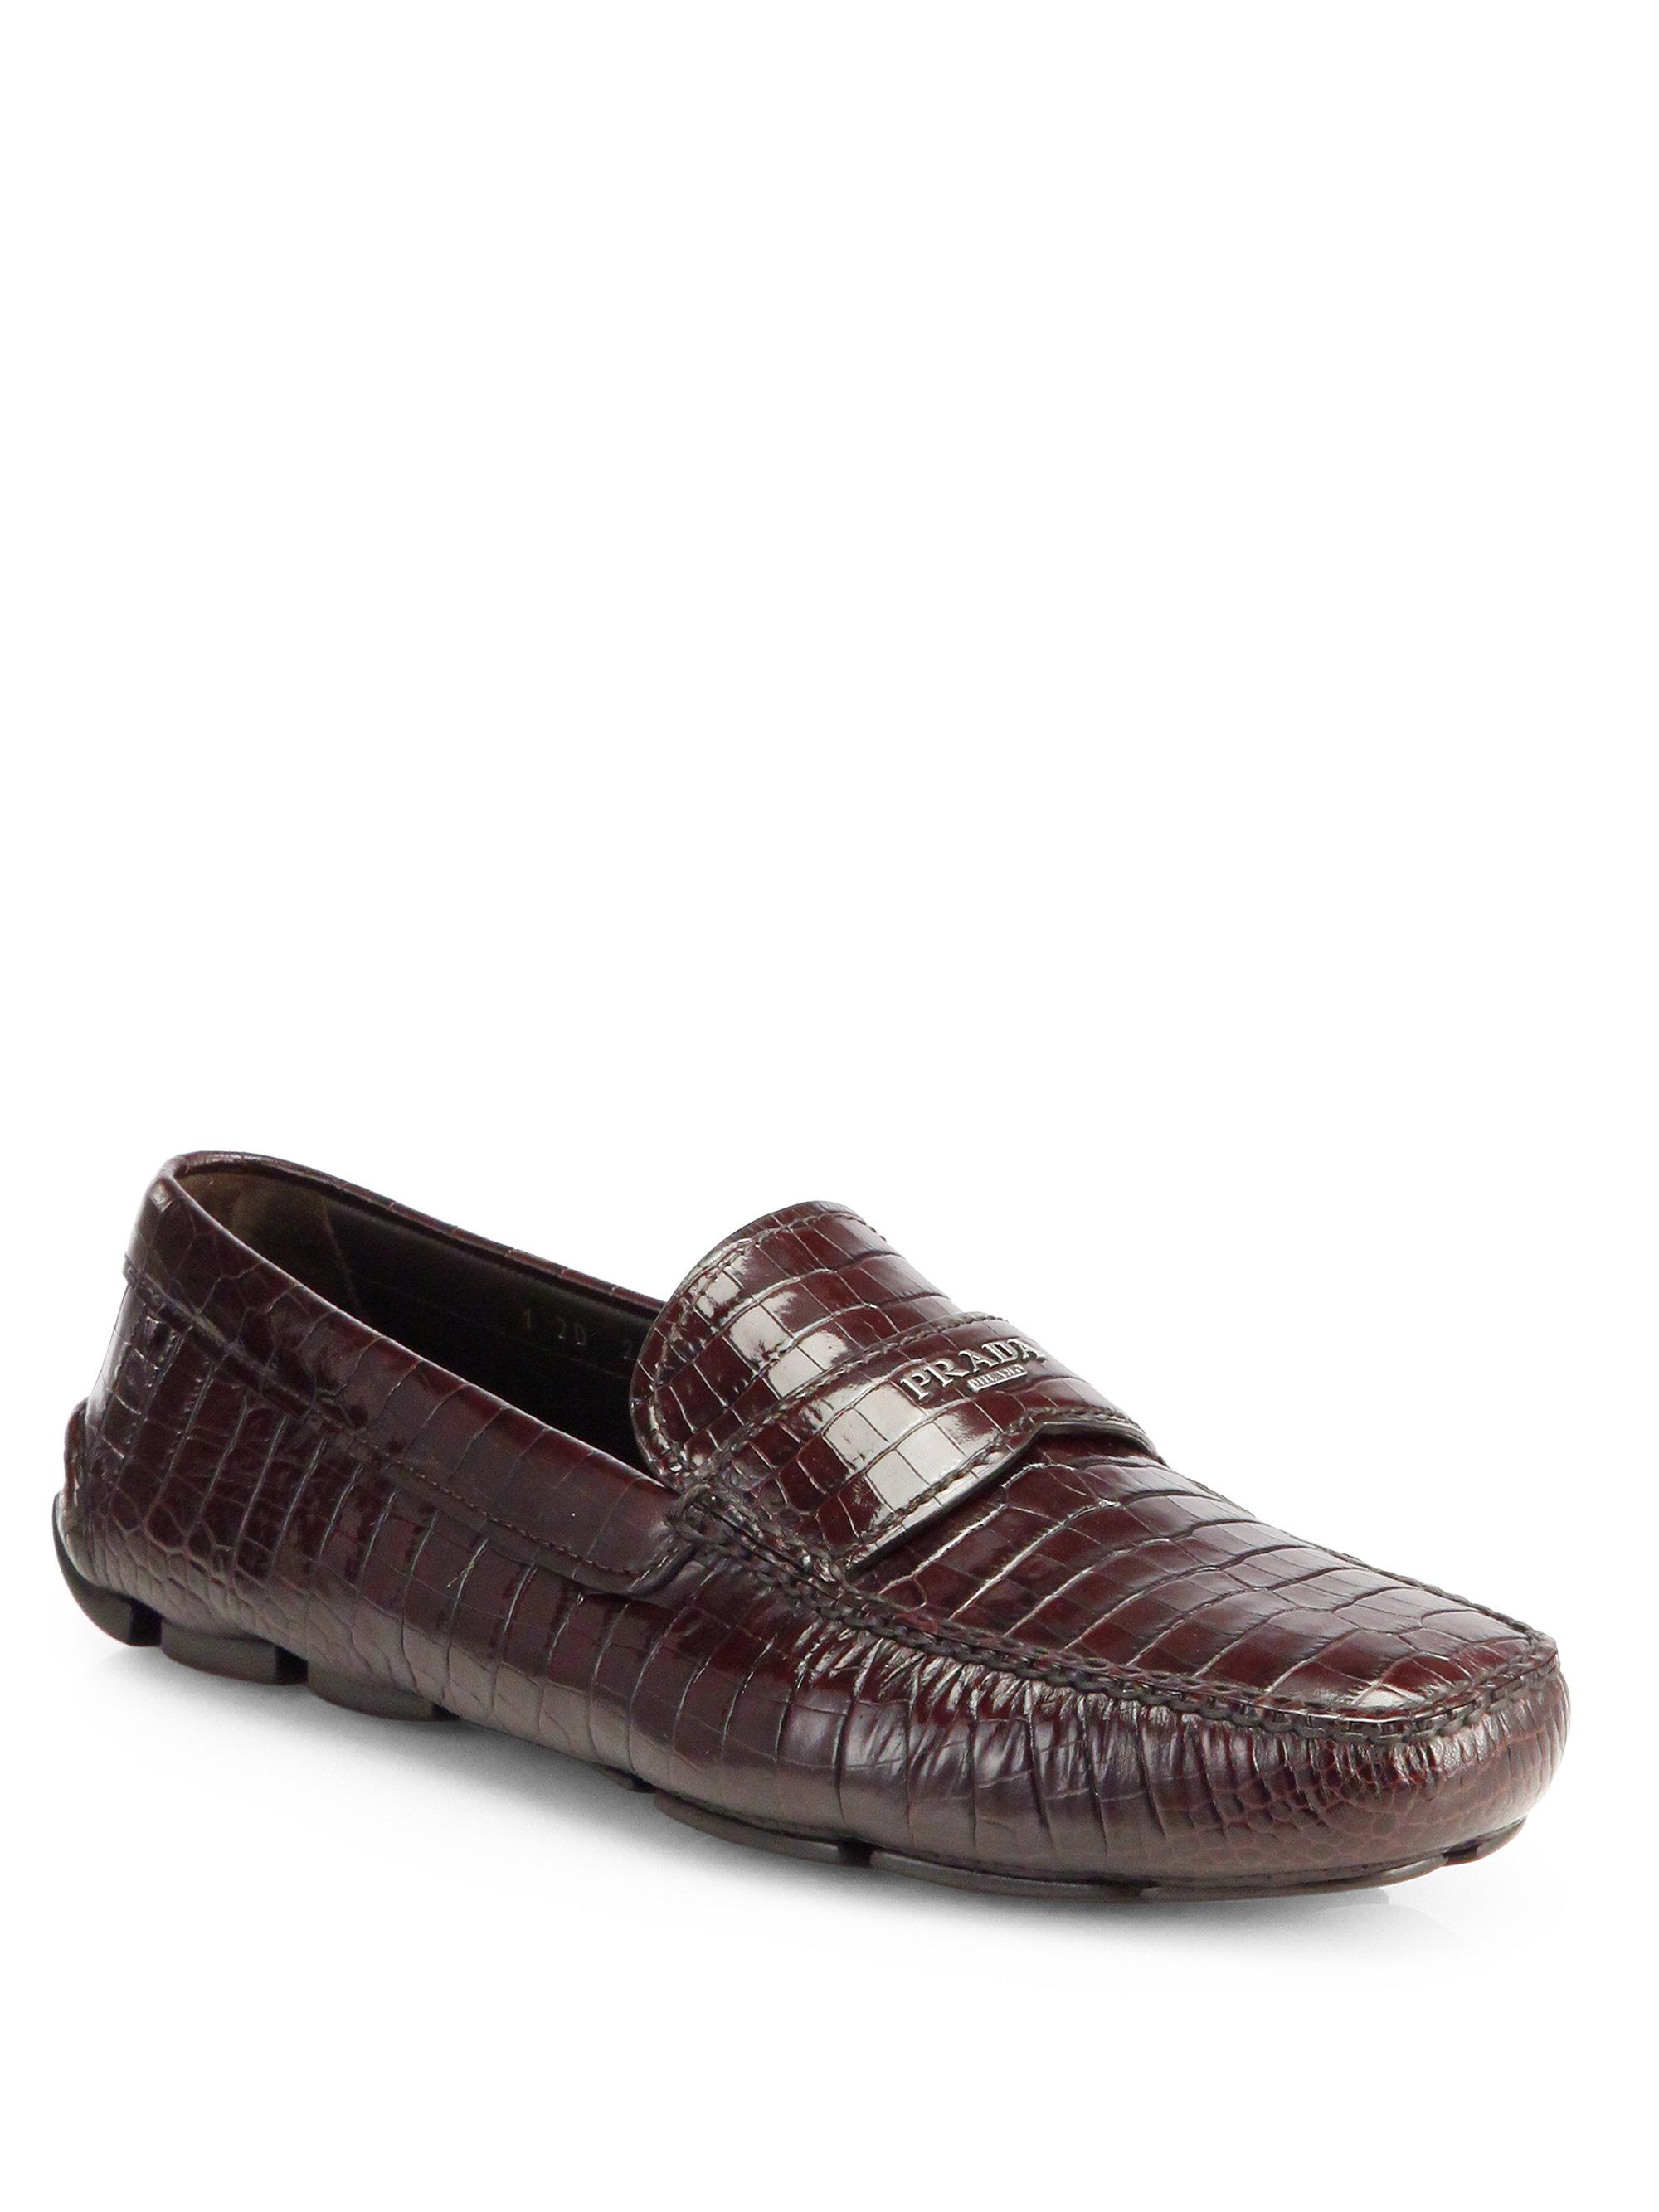 Prada Crocodile Shoes Mens